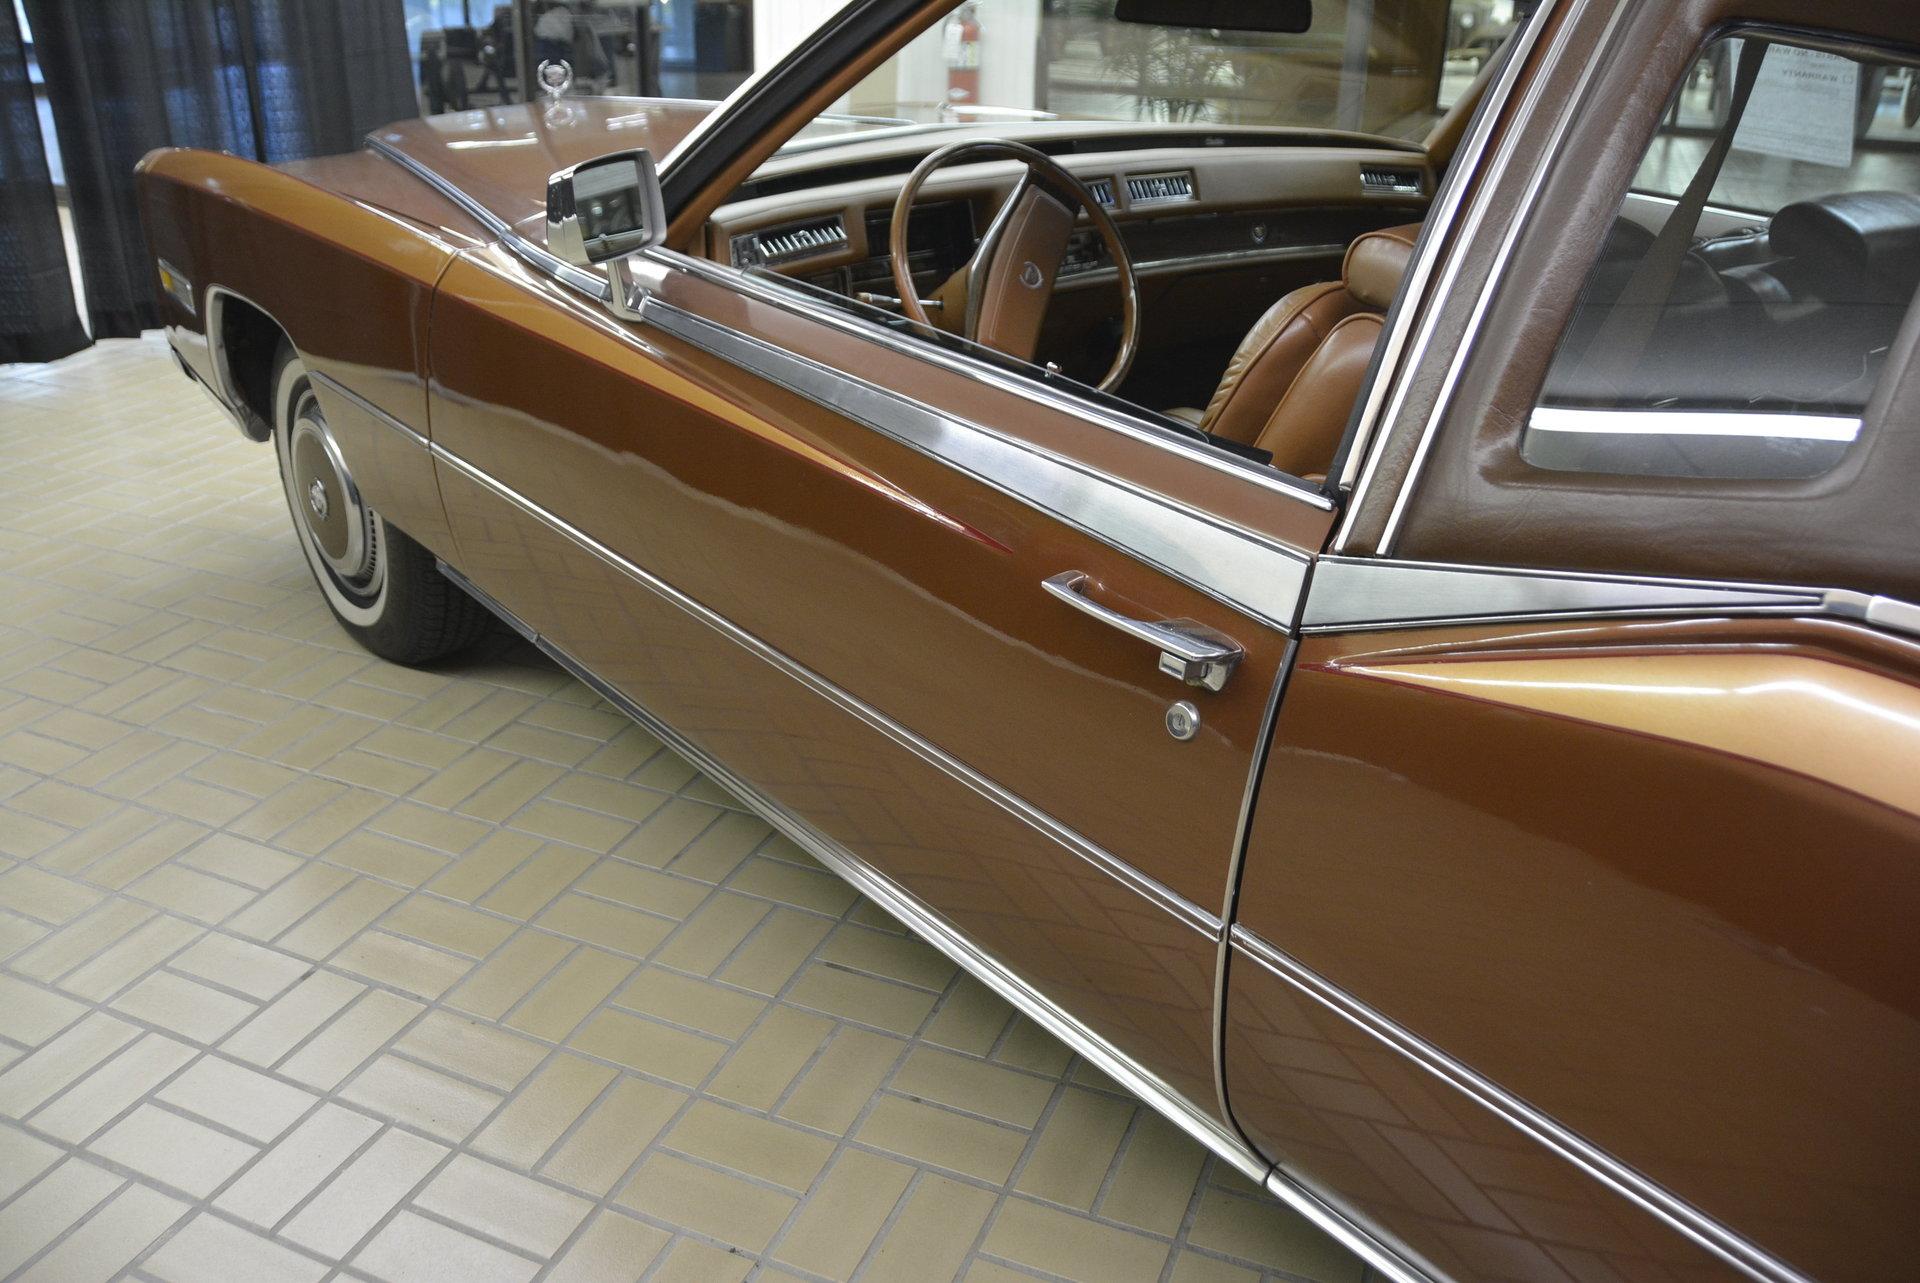 1978 Cadillac Eldorado Classic Auto Mall Sedan Deville 4 Door Biarritz